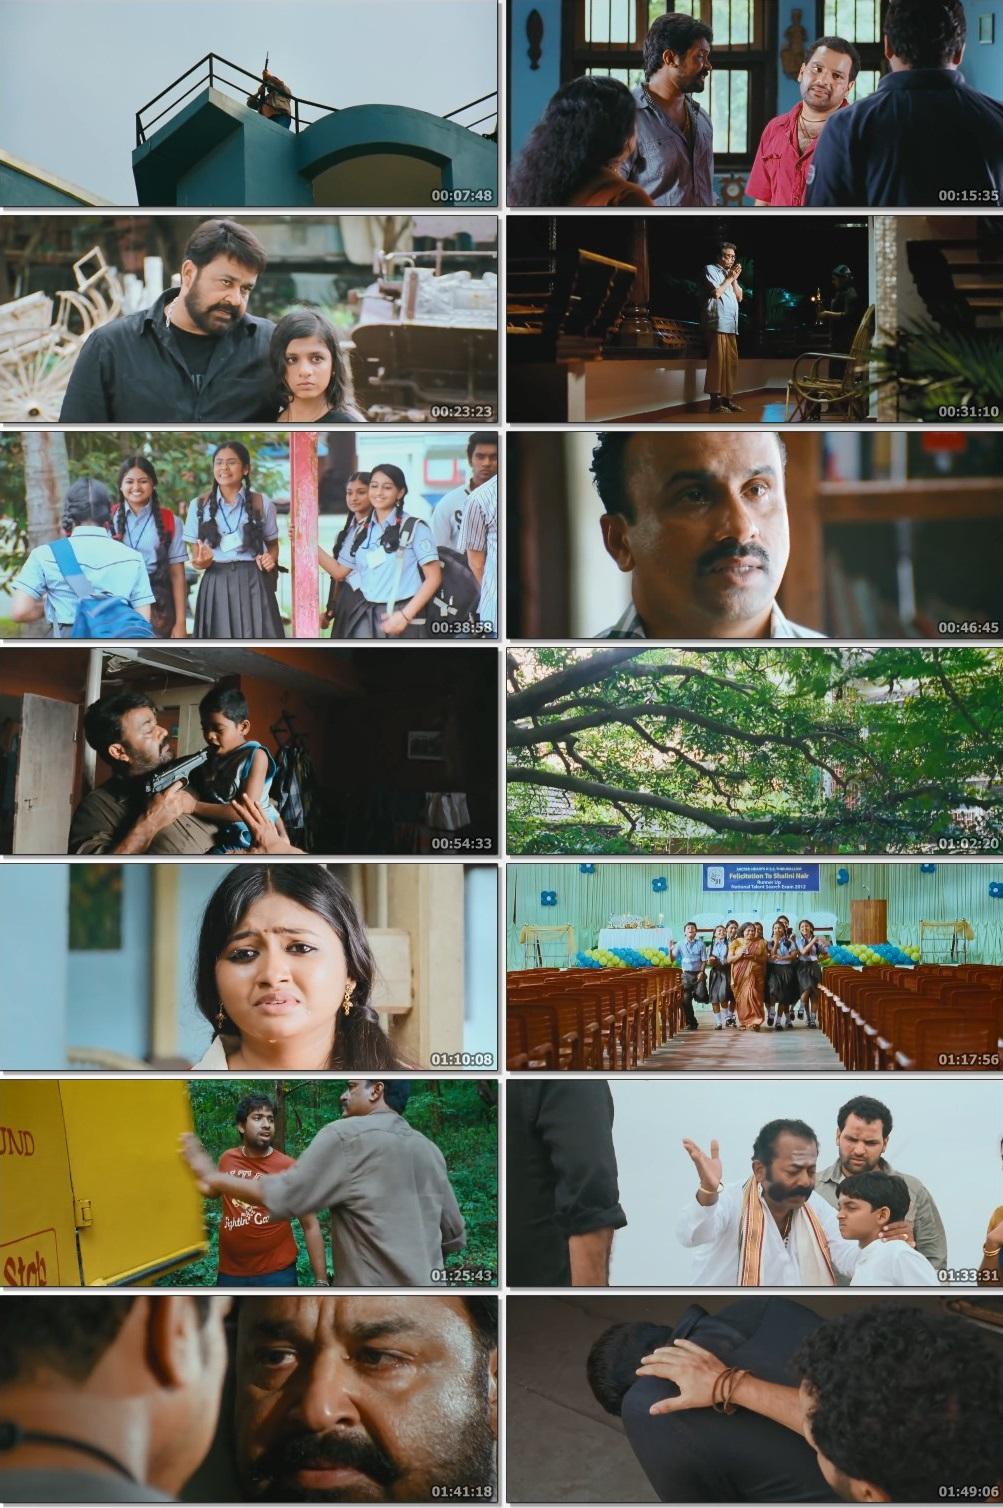 Download Vetrimaran IPS (2012) 1GB Full Hindi Dual Audio Movie Download 720p HDRip Free Watch Online Full Movie Download Worldfree4u 9xmovies